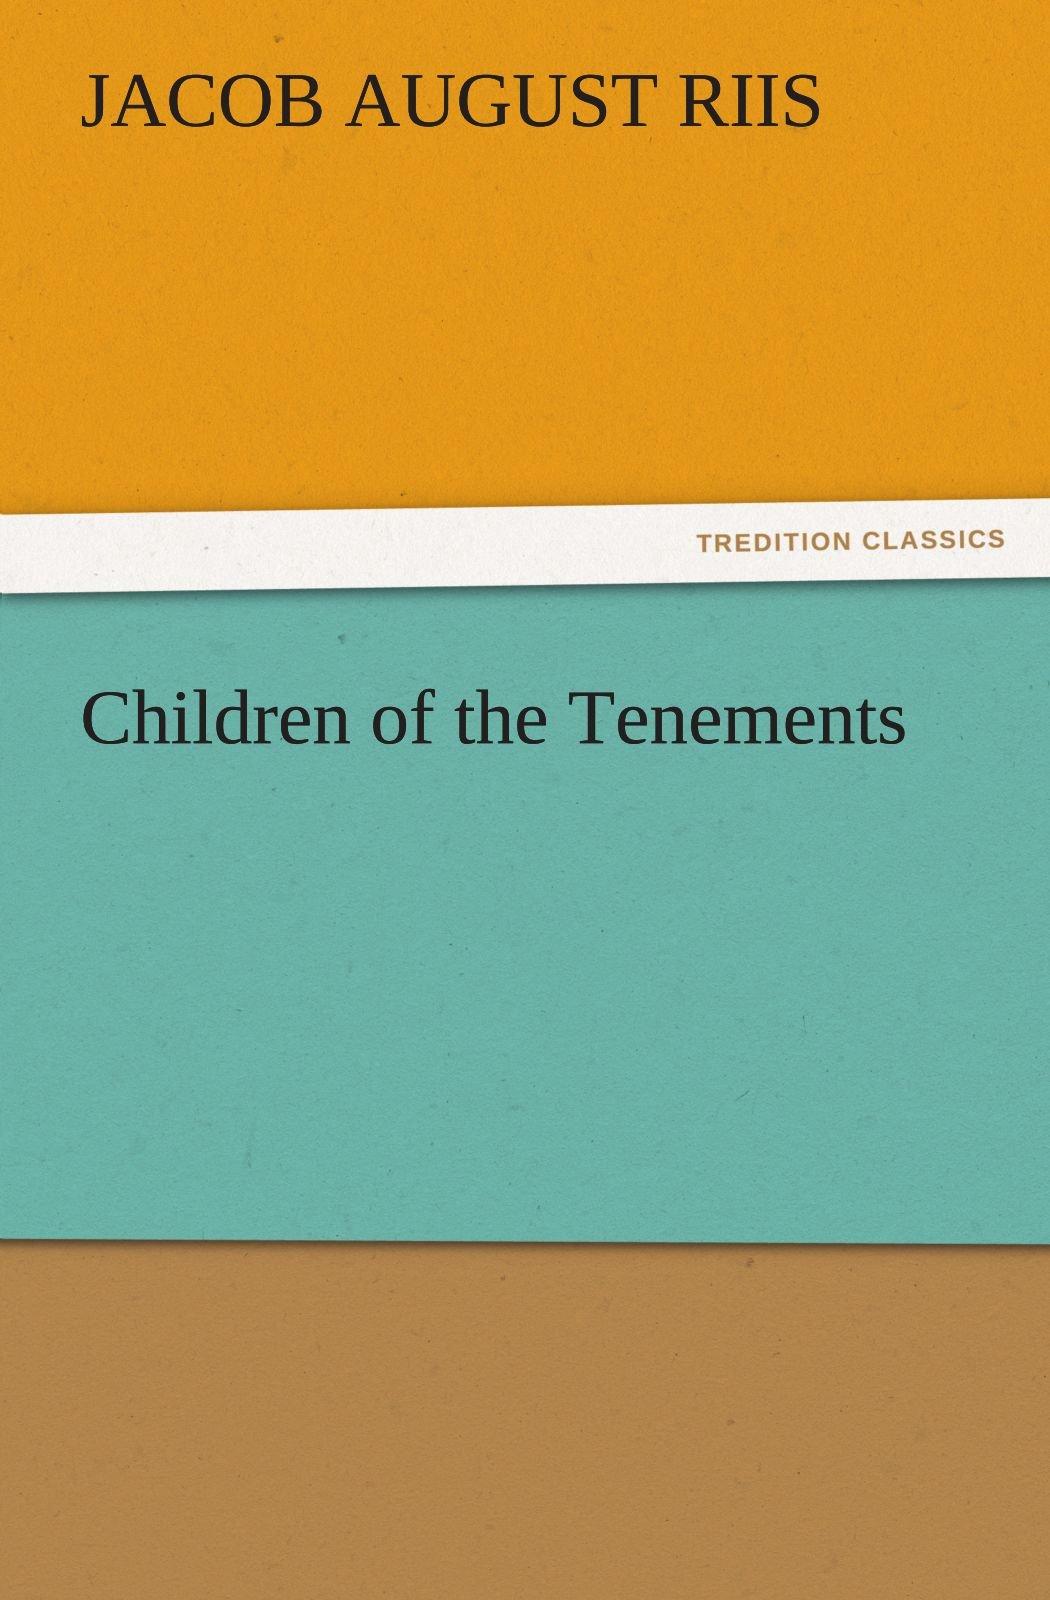 Download Children of the Tenements (TREDITION CLASSICS) pdf epub